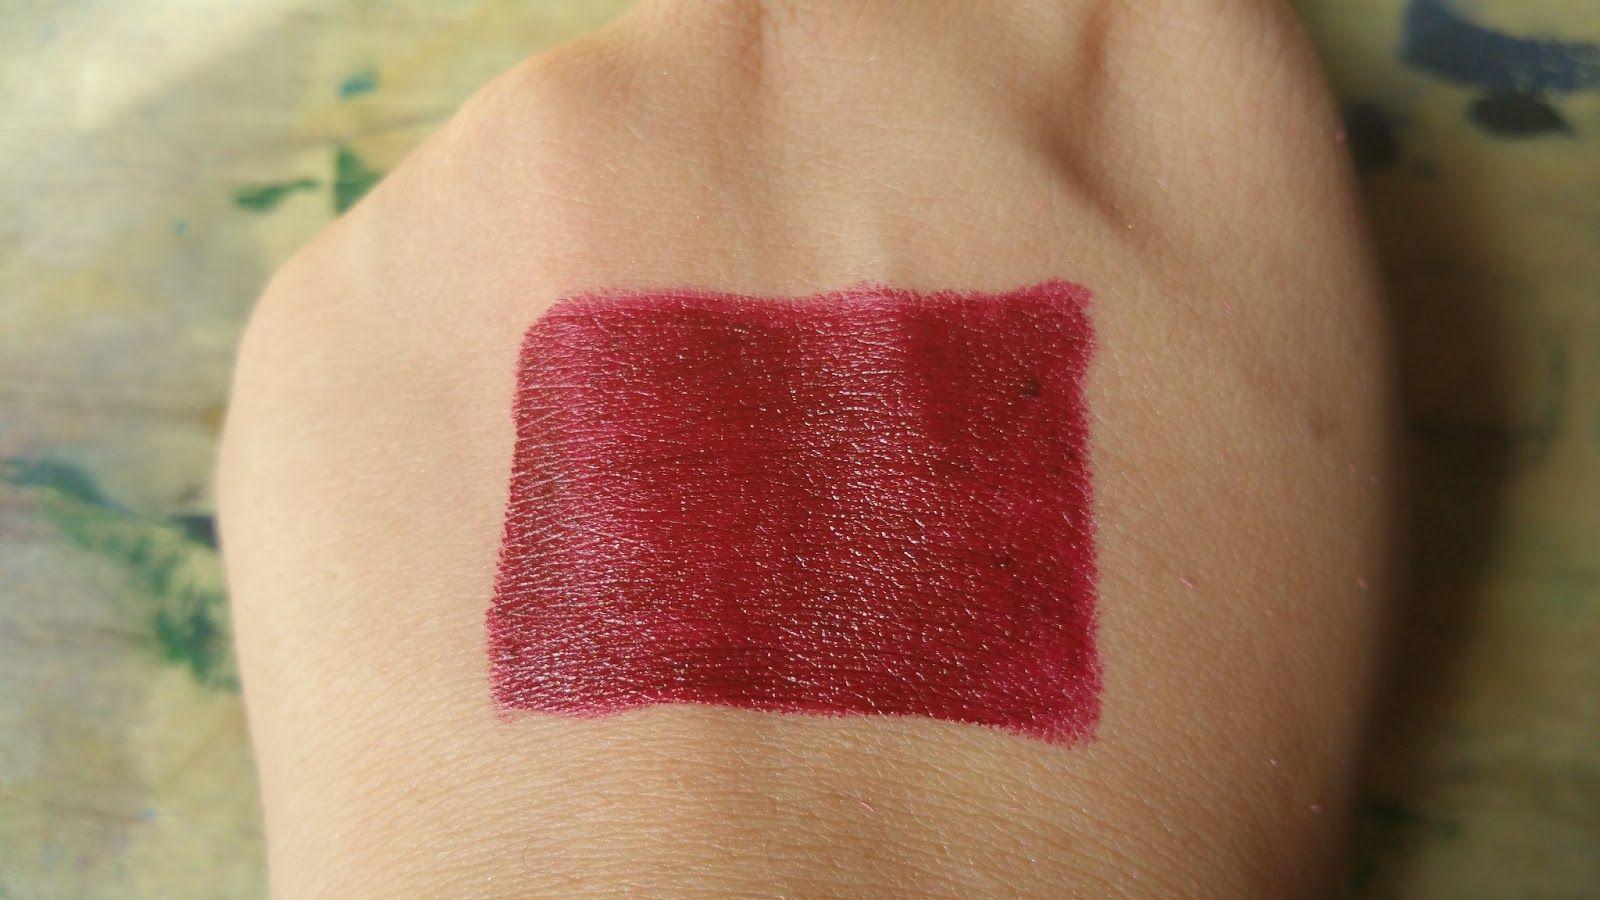 Medora Lipstick Shade In Dark Maroon 226 Medora Lipstick Makeup